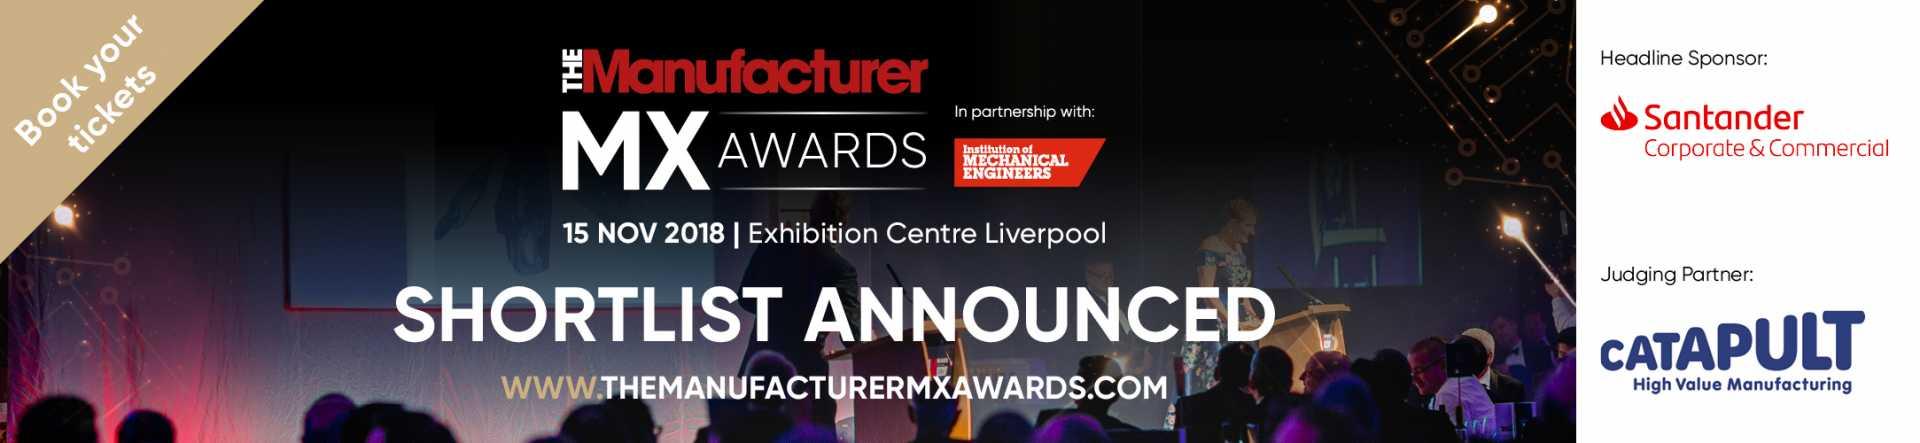 The Manufacturer MX Awards TMMX 2018 - Shortlist Announced Banner